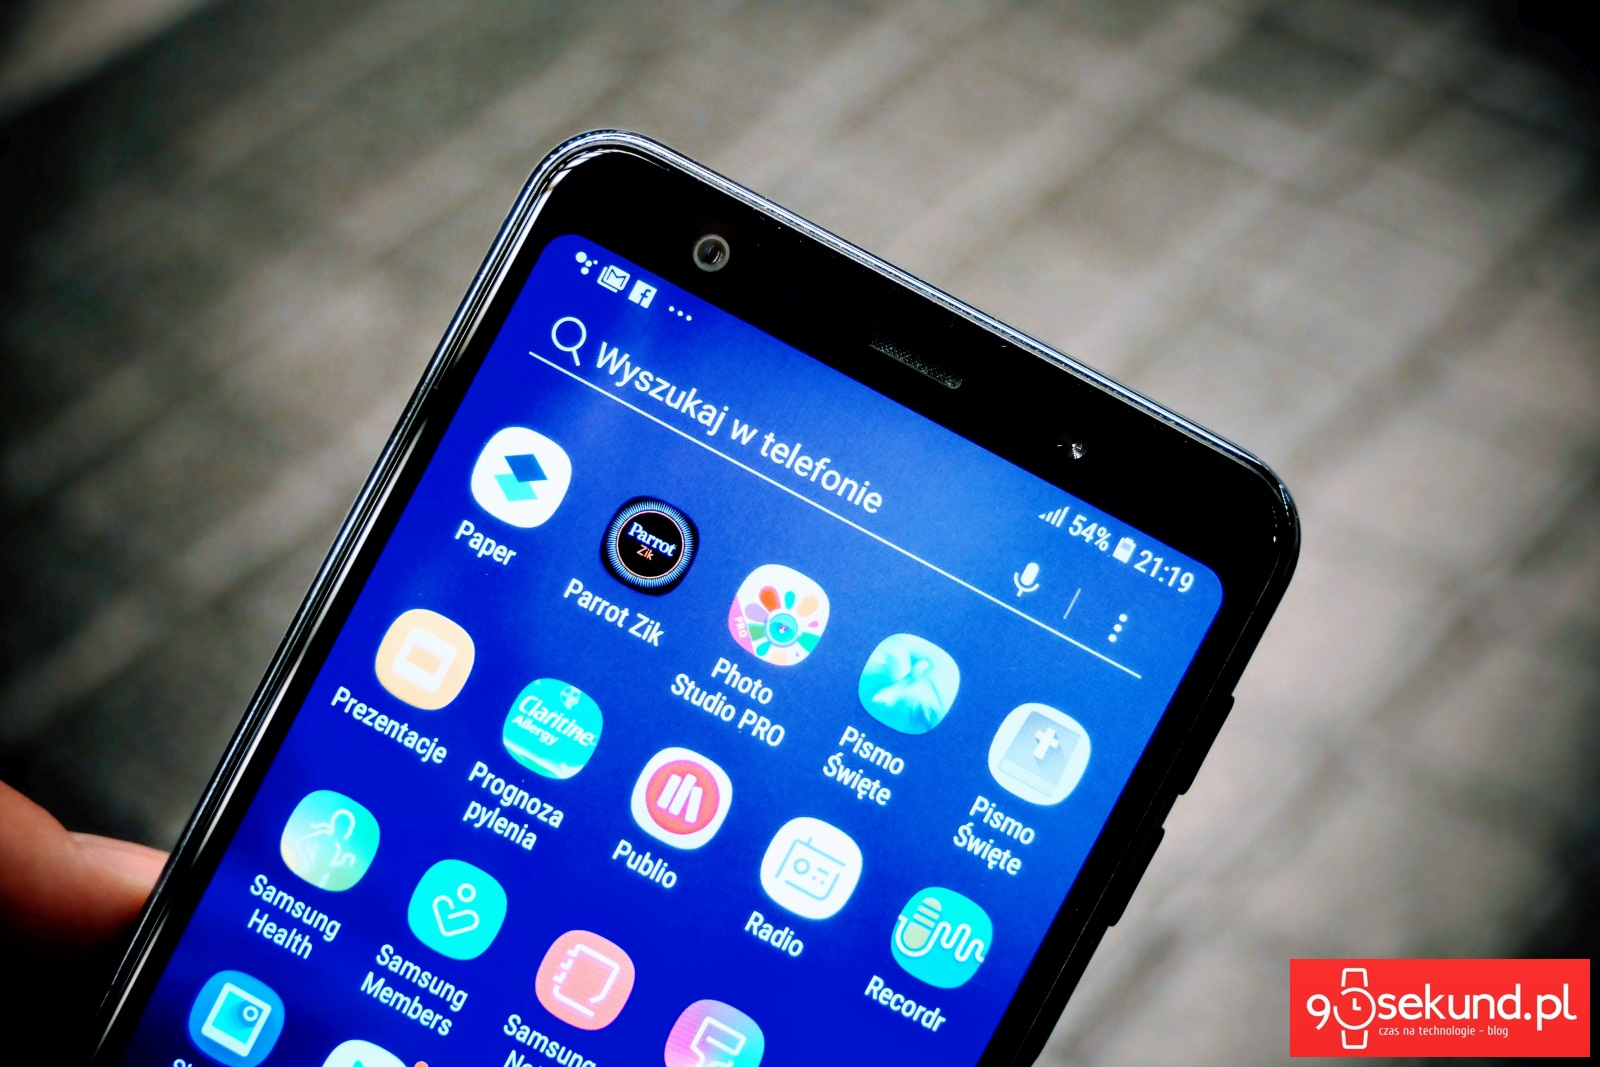 Recenzja Samsung Galaxy A7 2018 - Michał Brożyński 90sekund.pl